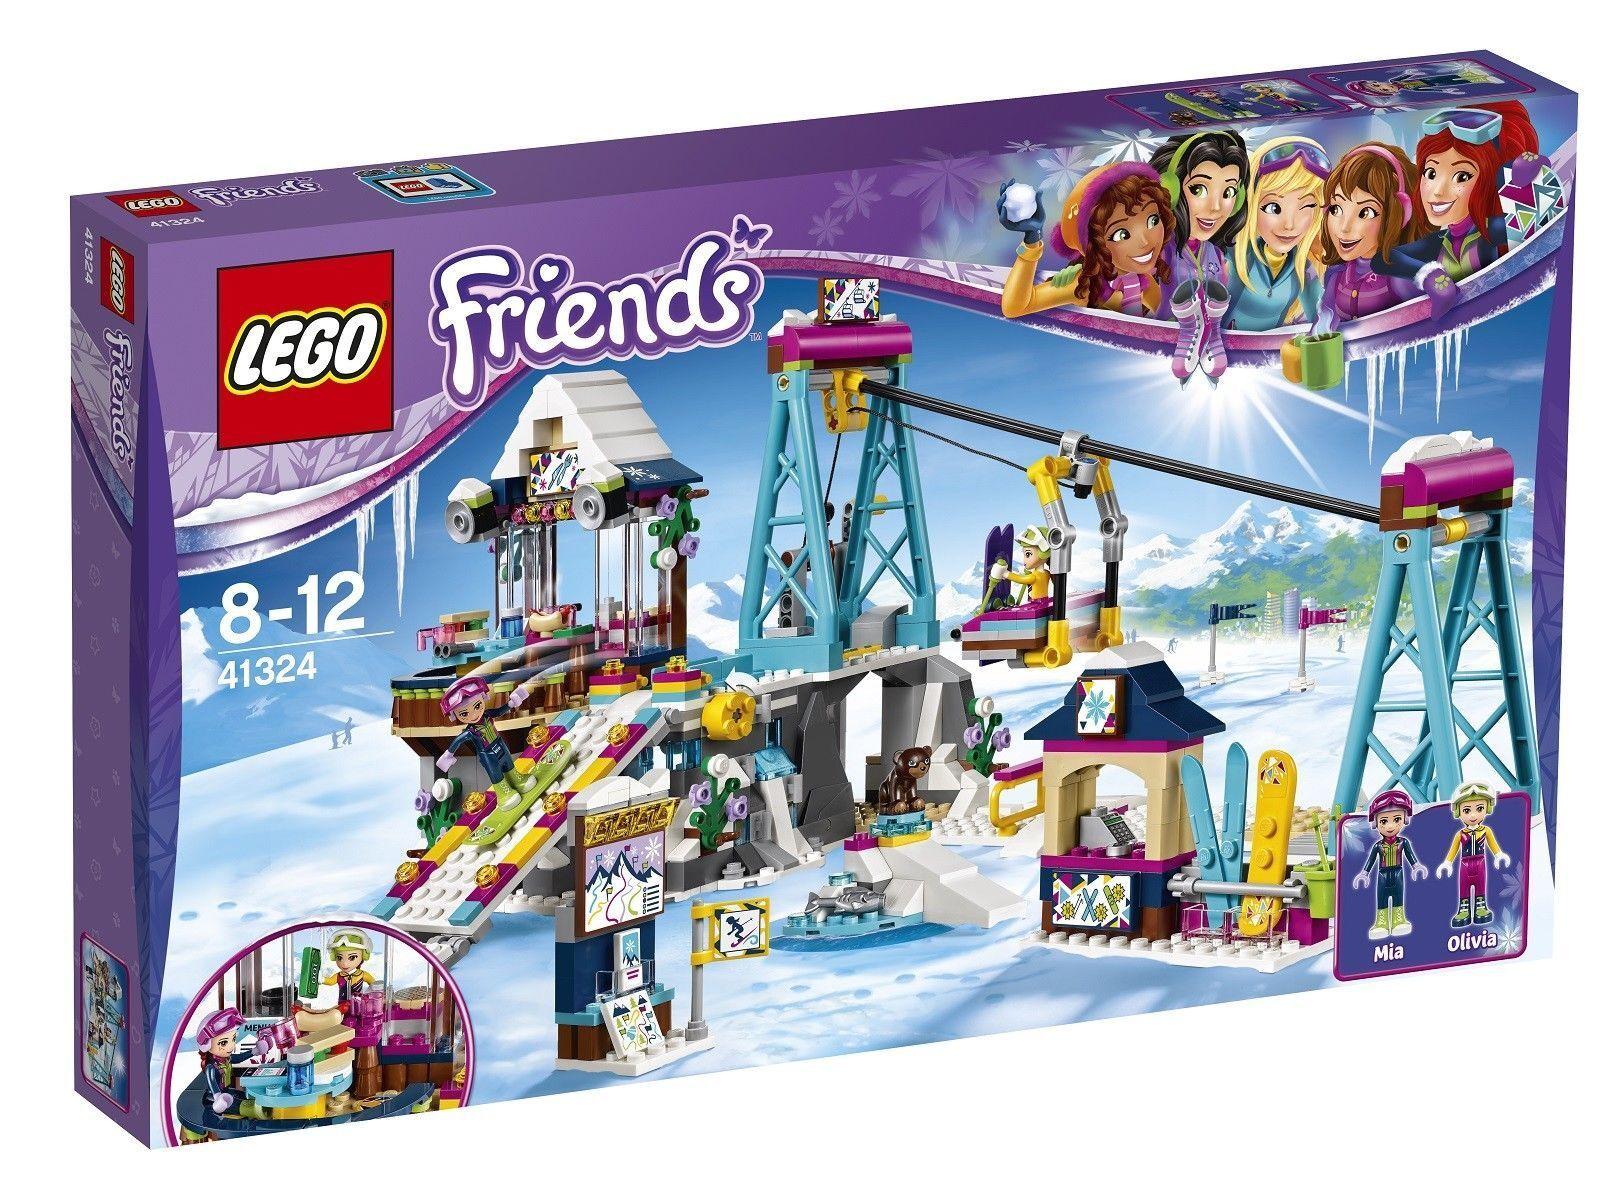 LEGO Friends 41324: Snow Resort Ski Lift - Brand New